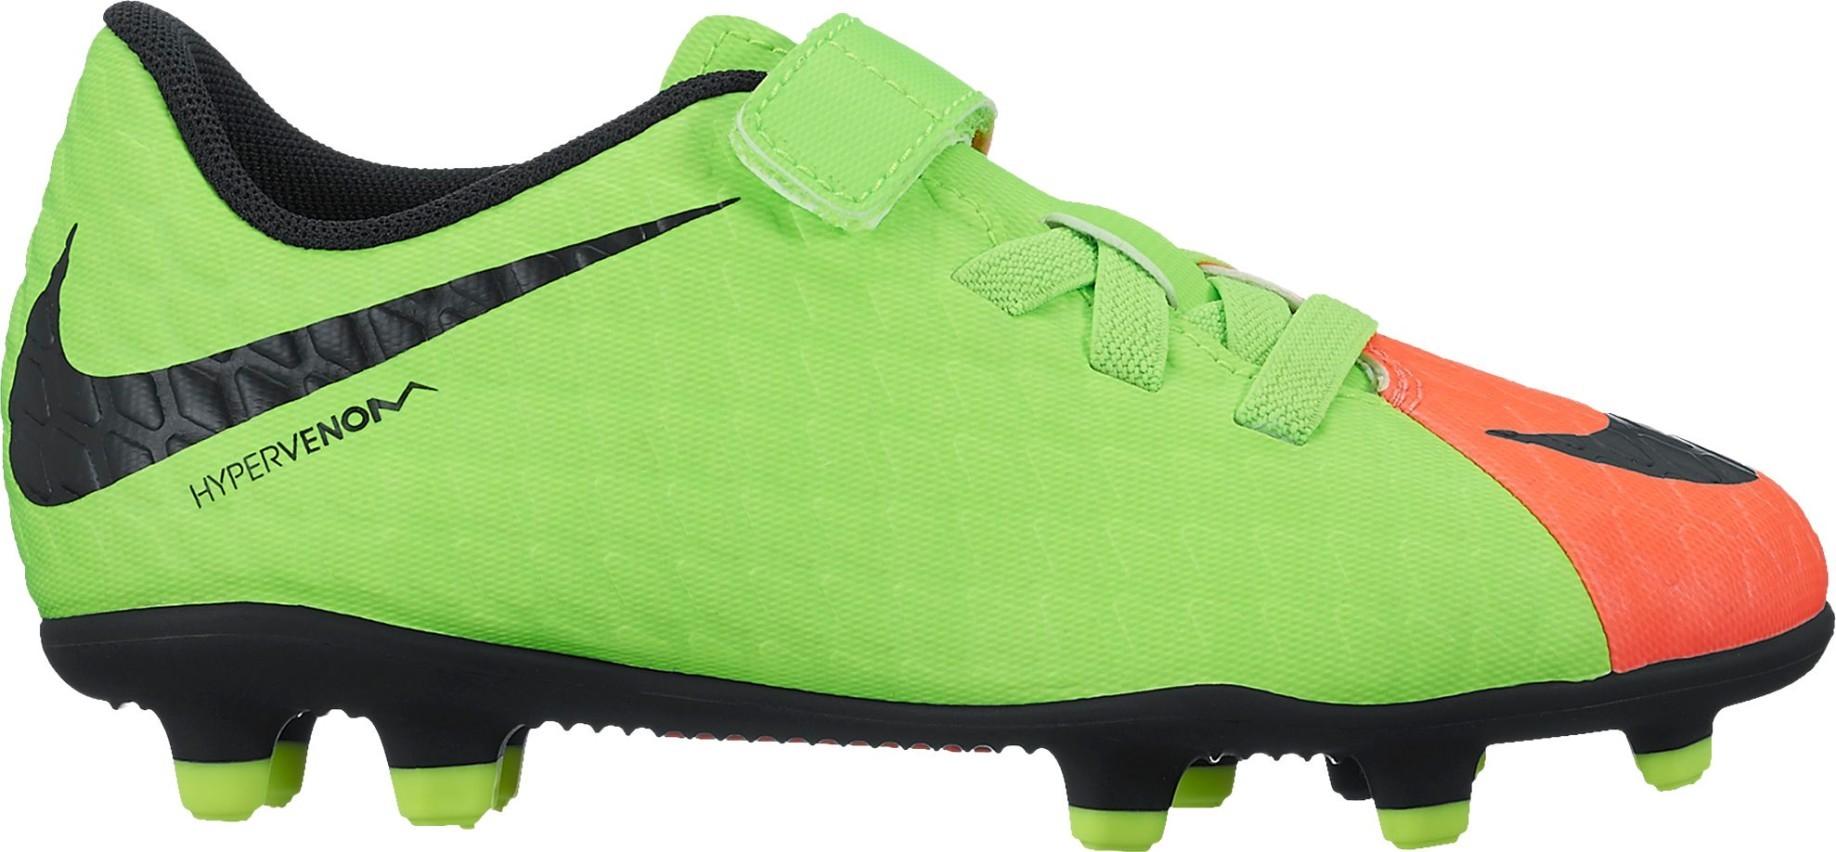 Nike Fußballschuhe Hypervenom Phade III FG JR US 5Y - EU 37,5